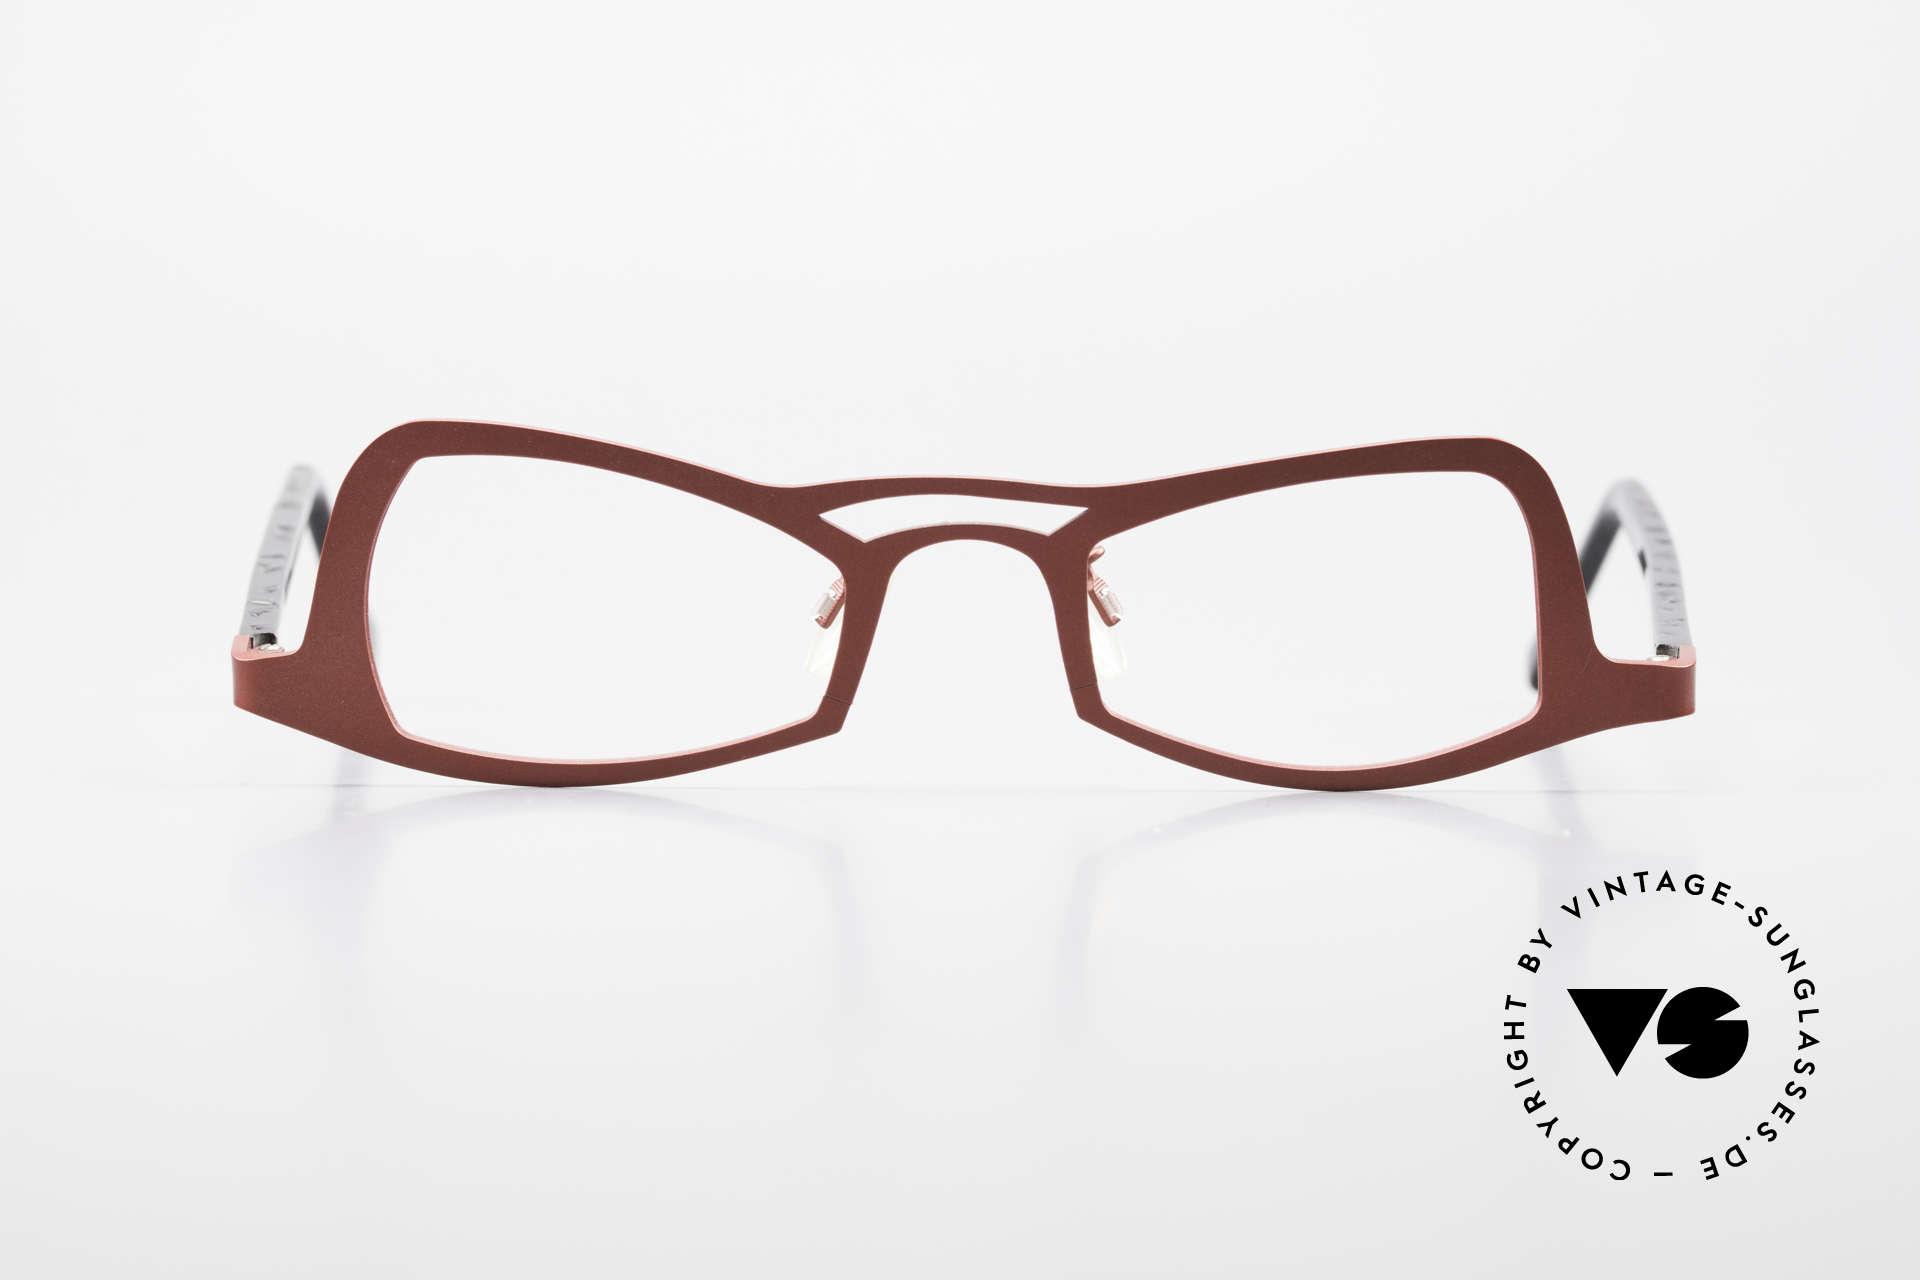 Theo Belgium Eye-Witness JK Pure Titanium Ladies Glasses, enchanting designer frame (late 1990's/ early 2000's), Made for Women